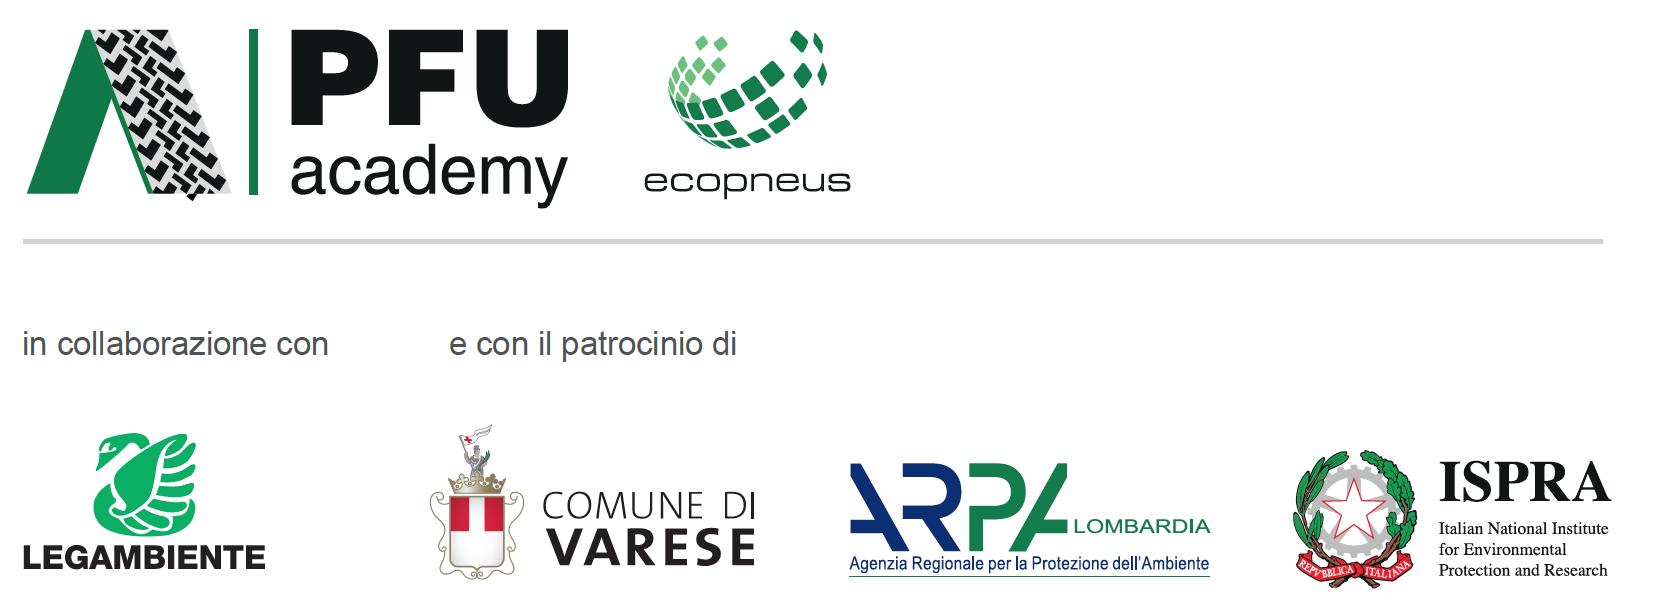 PFU Academy Varese